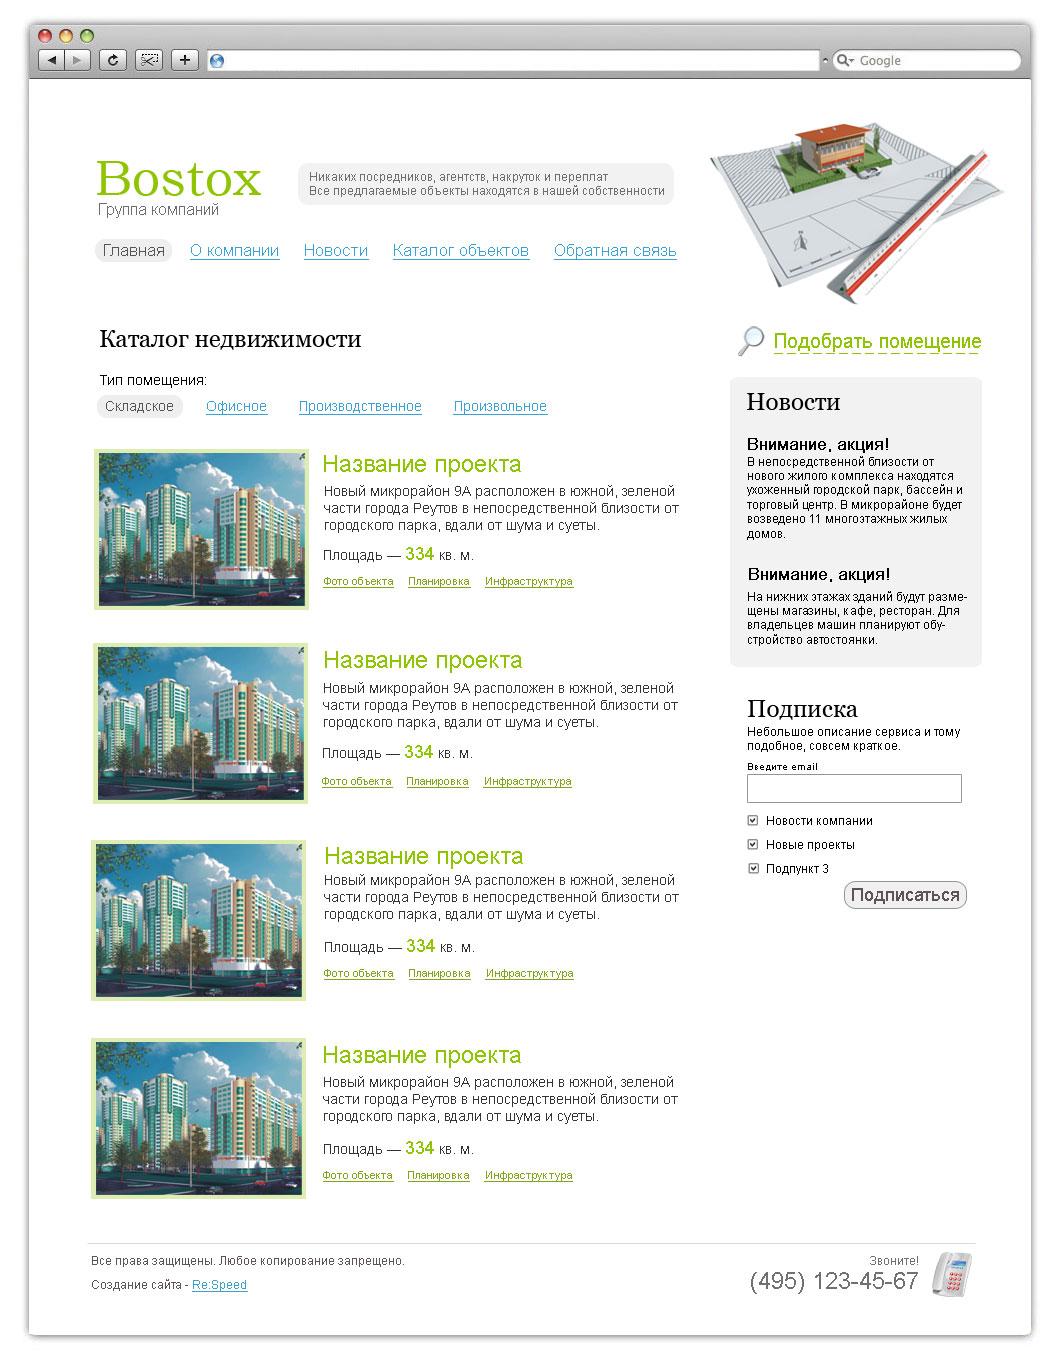 Bostox - Каталог недвижимости